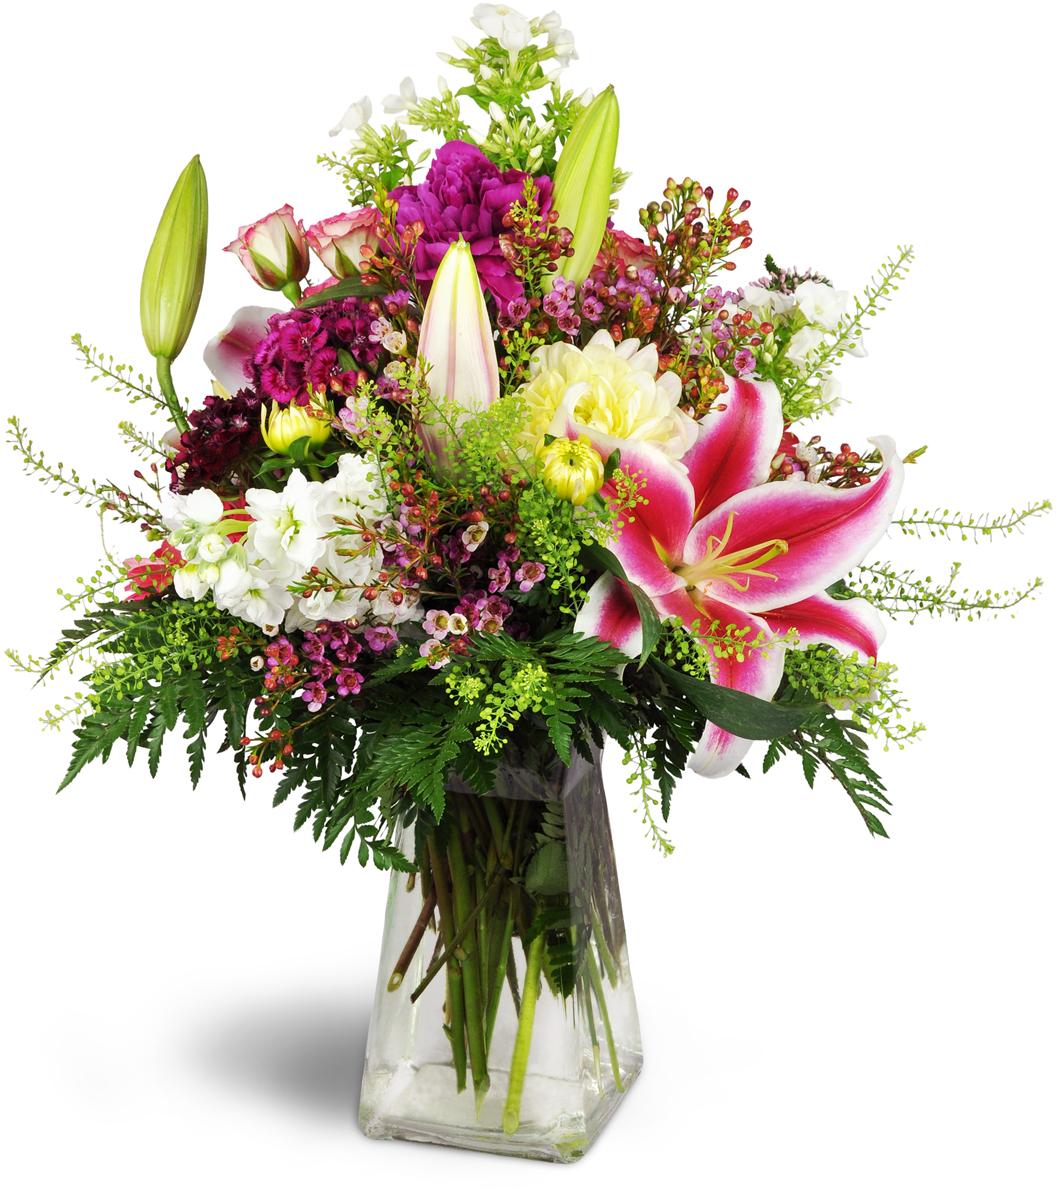 Springs Bounty Bouquet Crystal Mn Florist